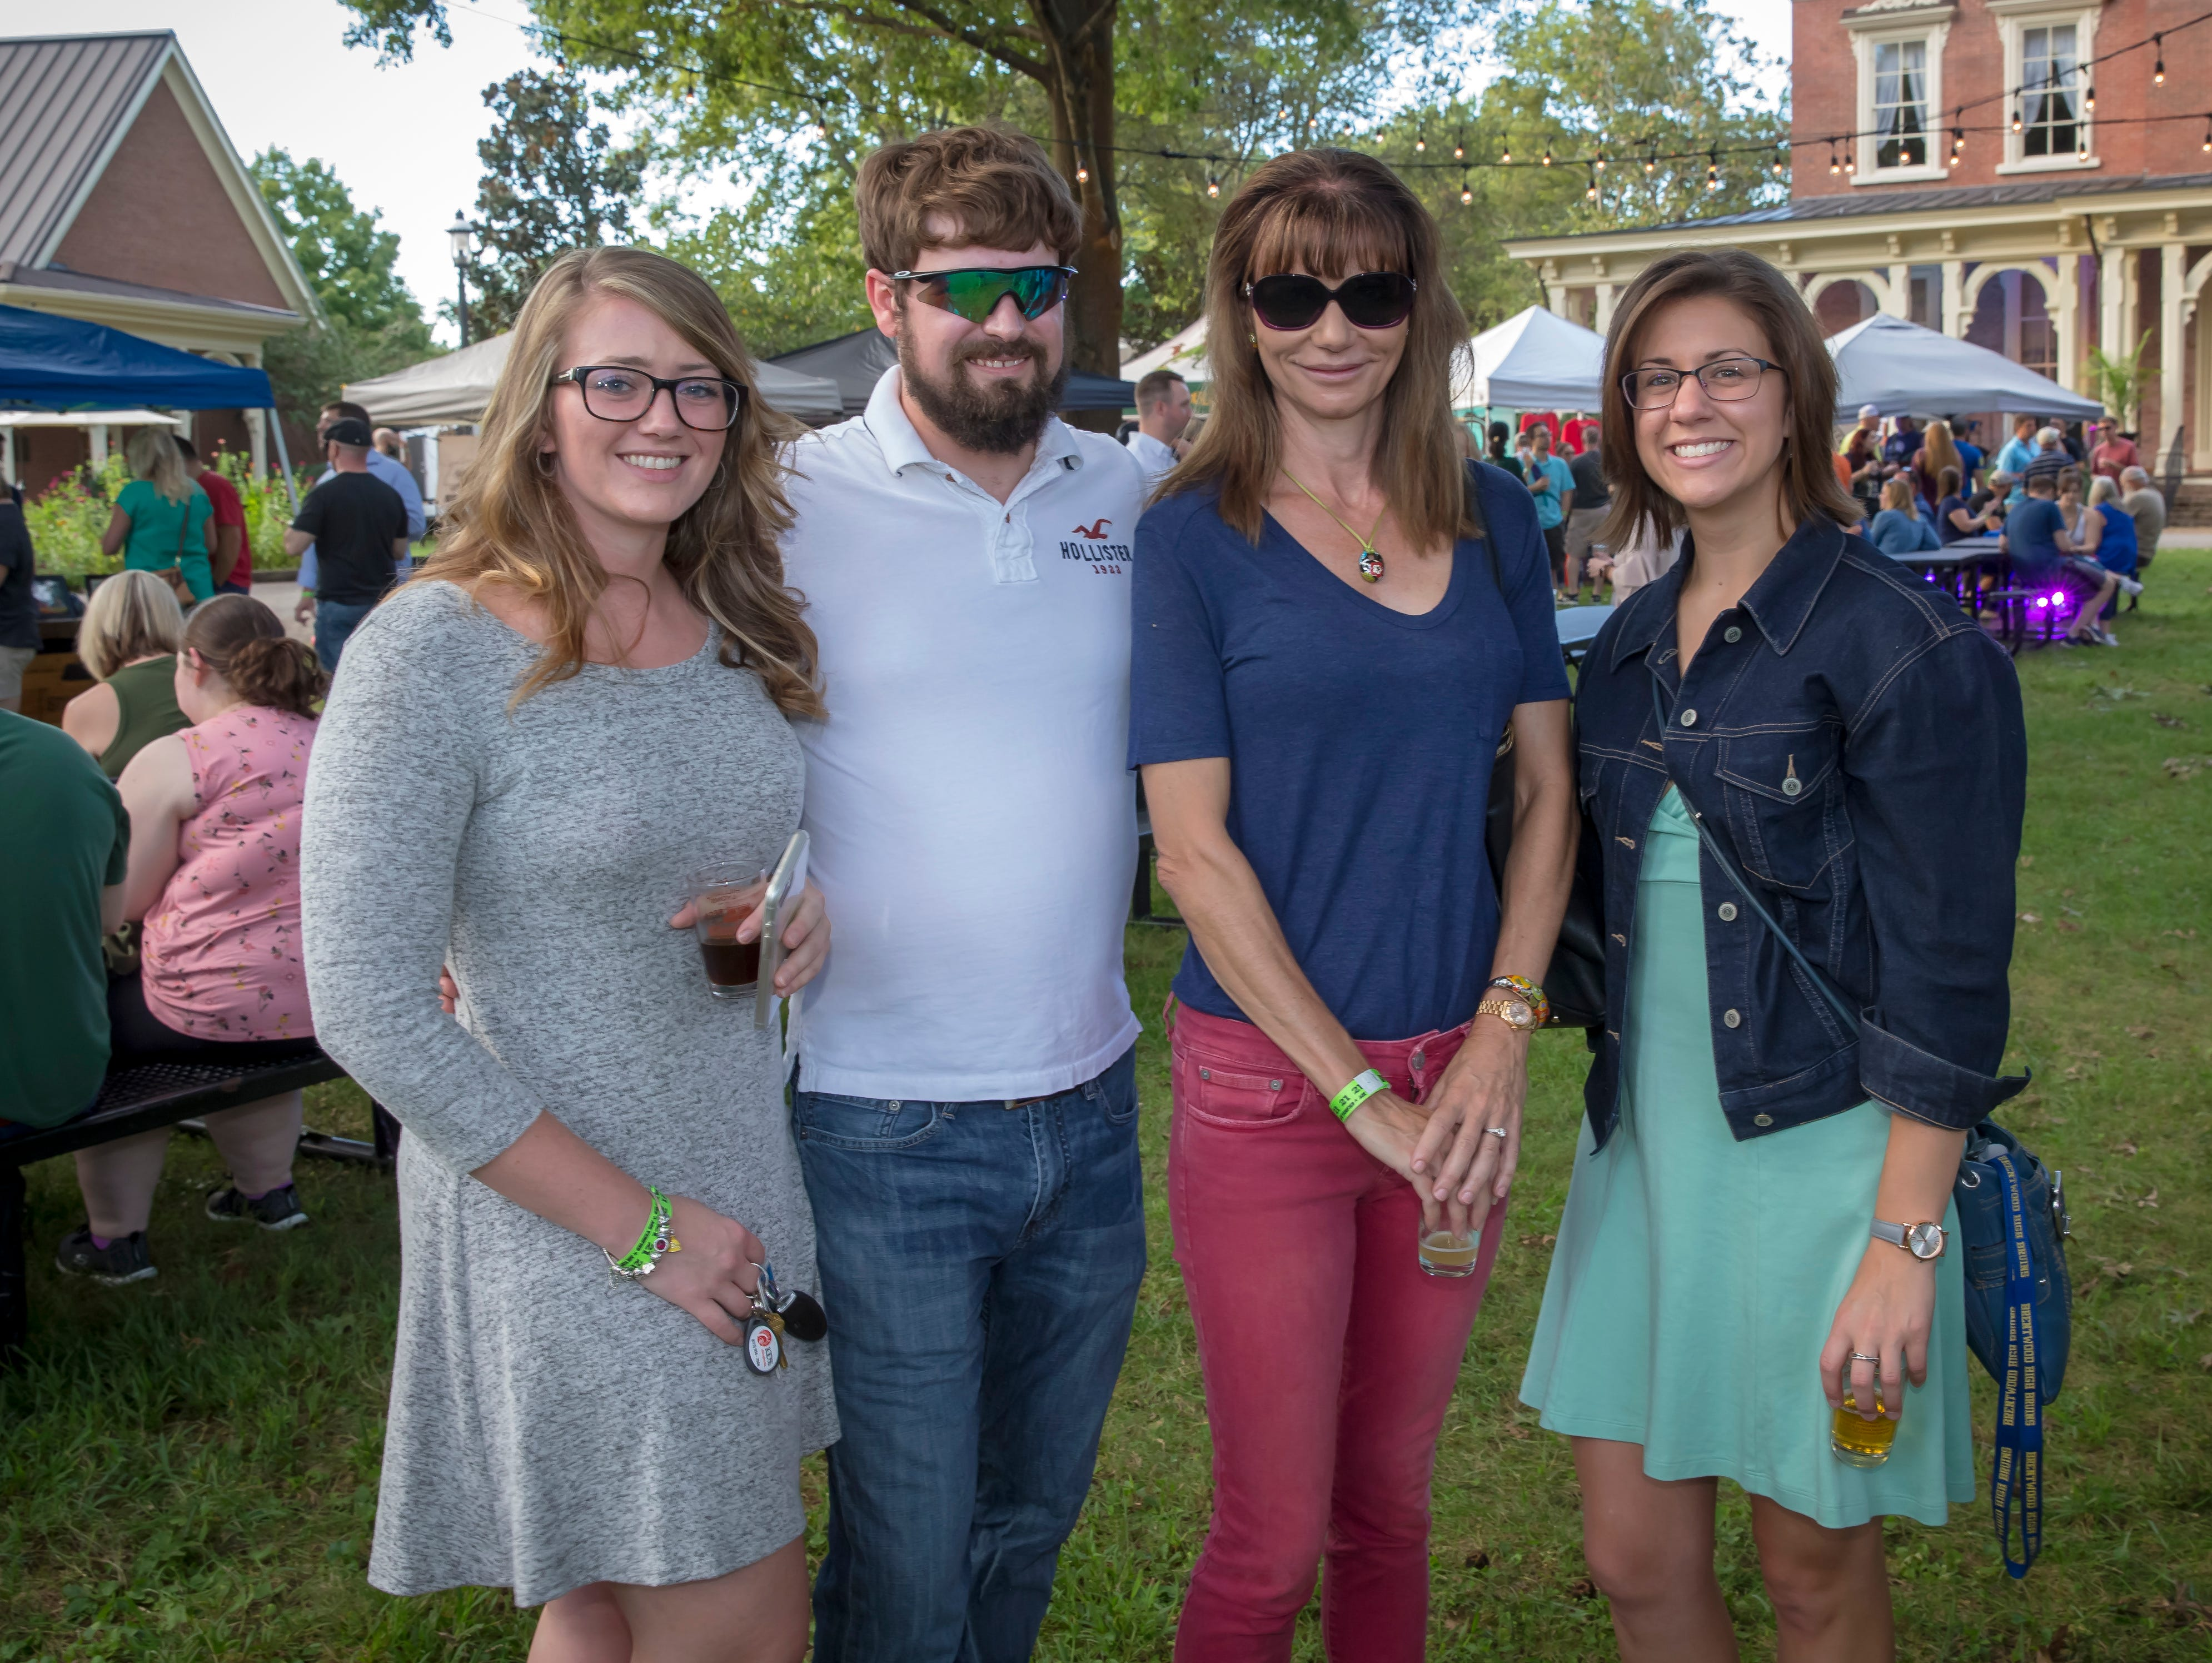 Stephanie Shanks, Andrew Kemp, Mary Sample and Brooke Klinefetter at the fourth-annual Oktoberfest held at Oaklands Mansion.Jim Davis/for the DNJ